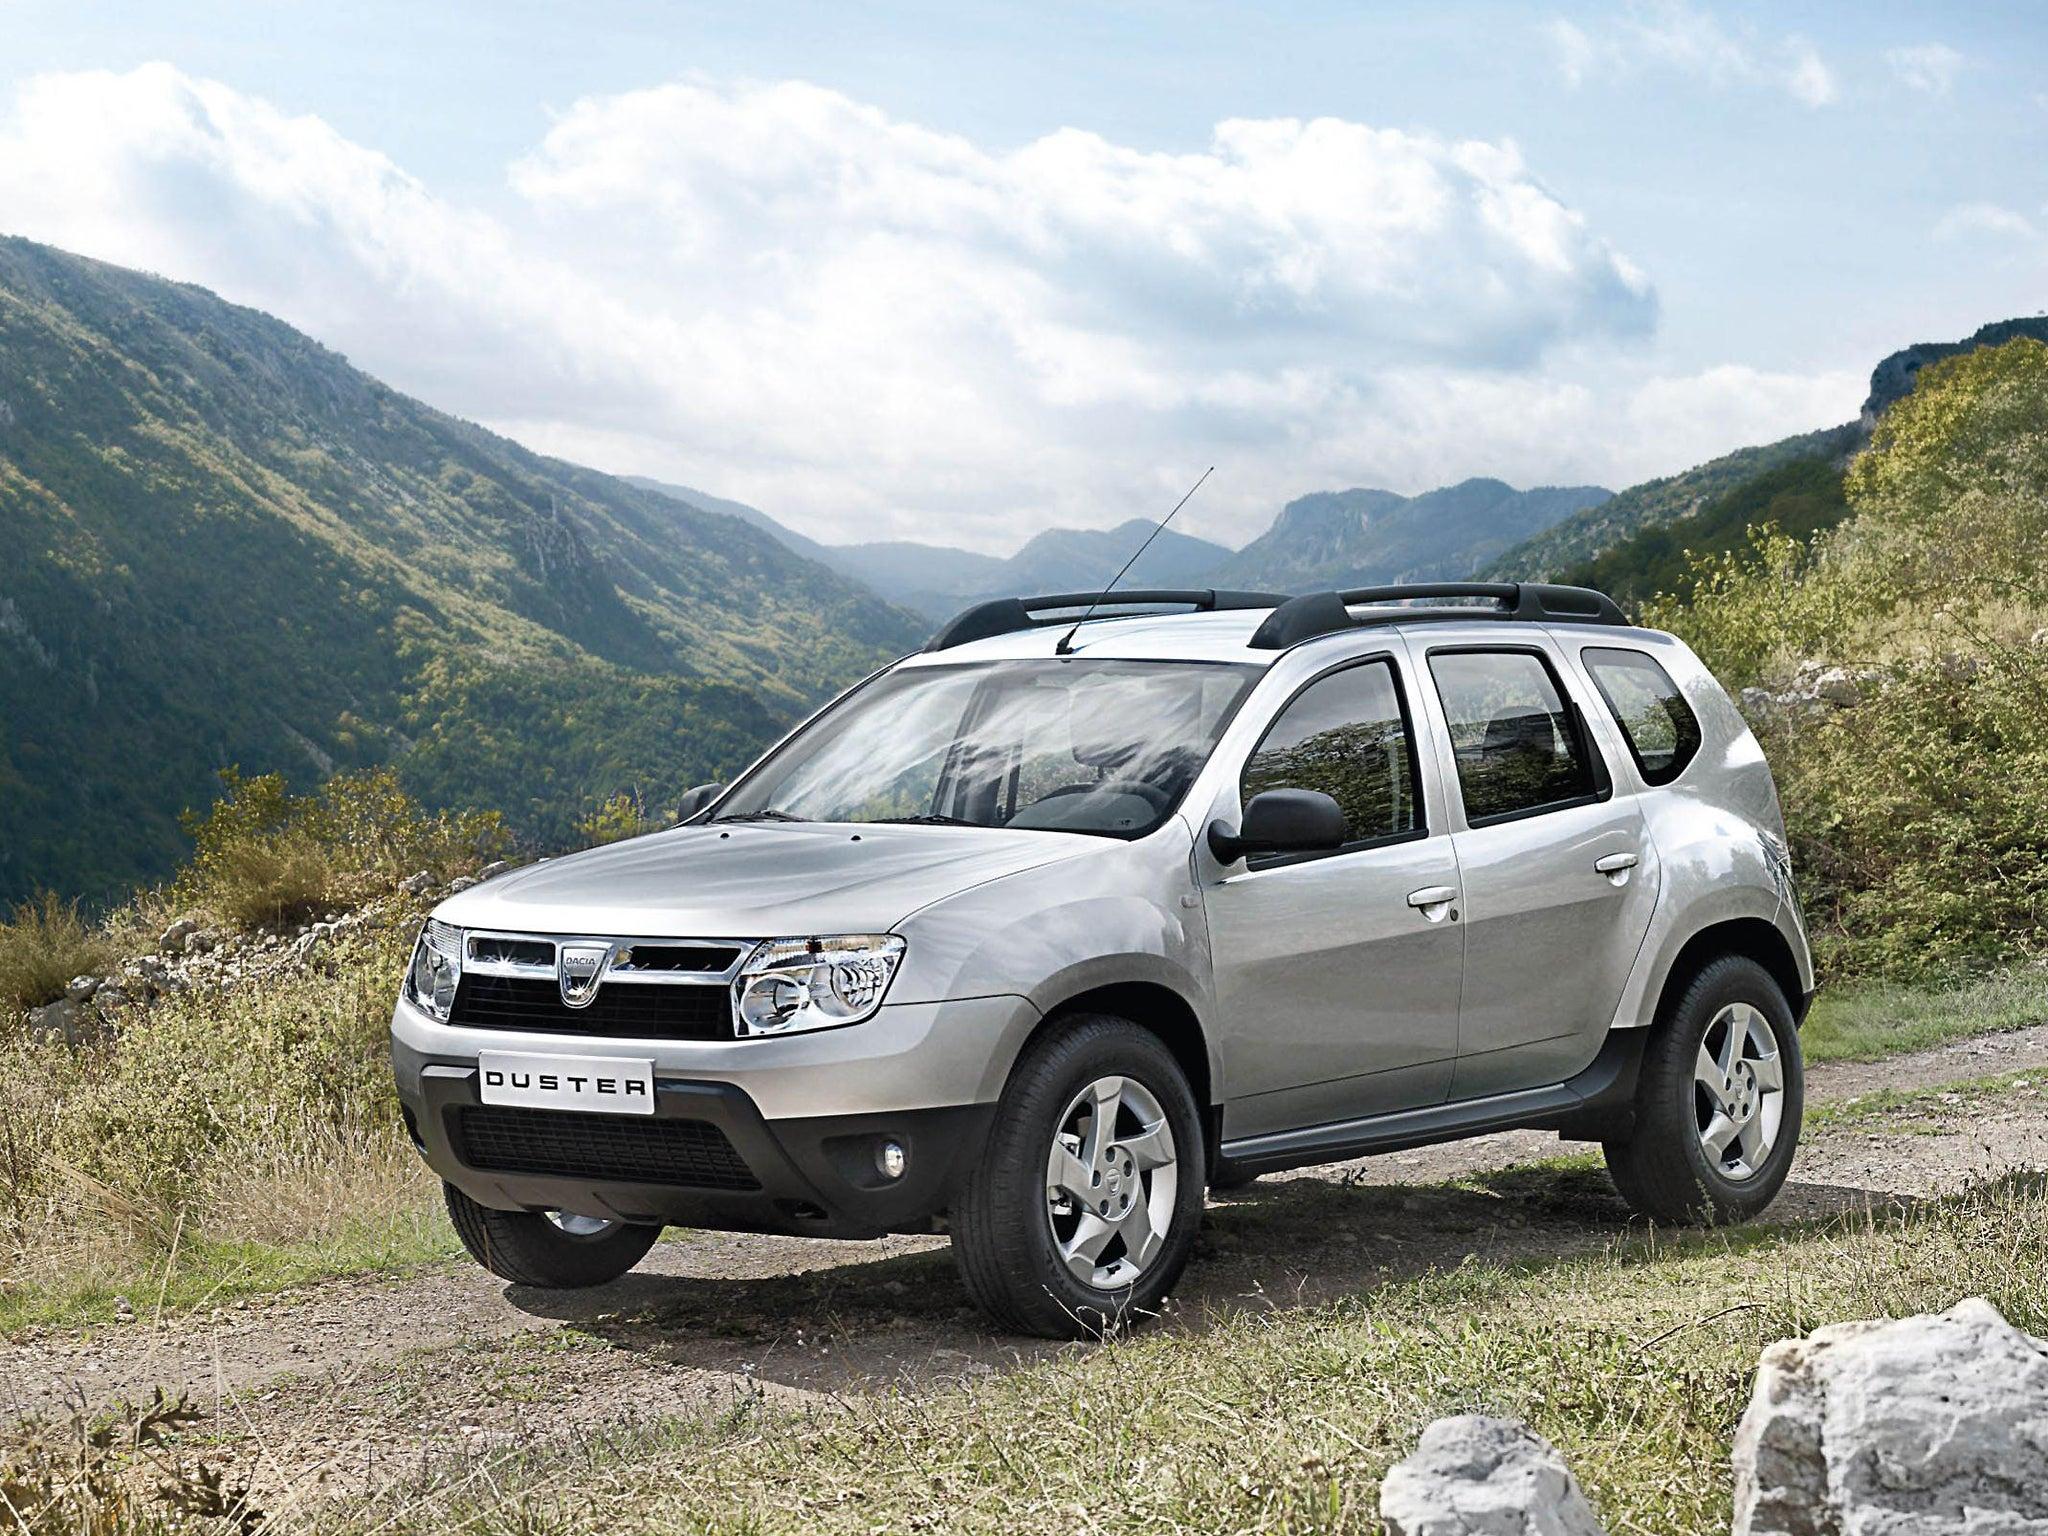 Dacia duster laureate dci 110 4x4 first drive the for Interni dacia duster laureate